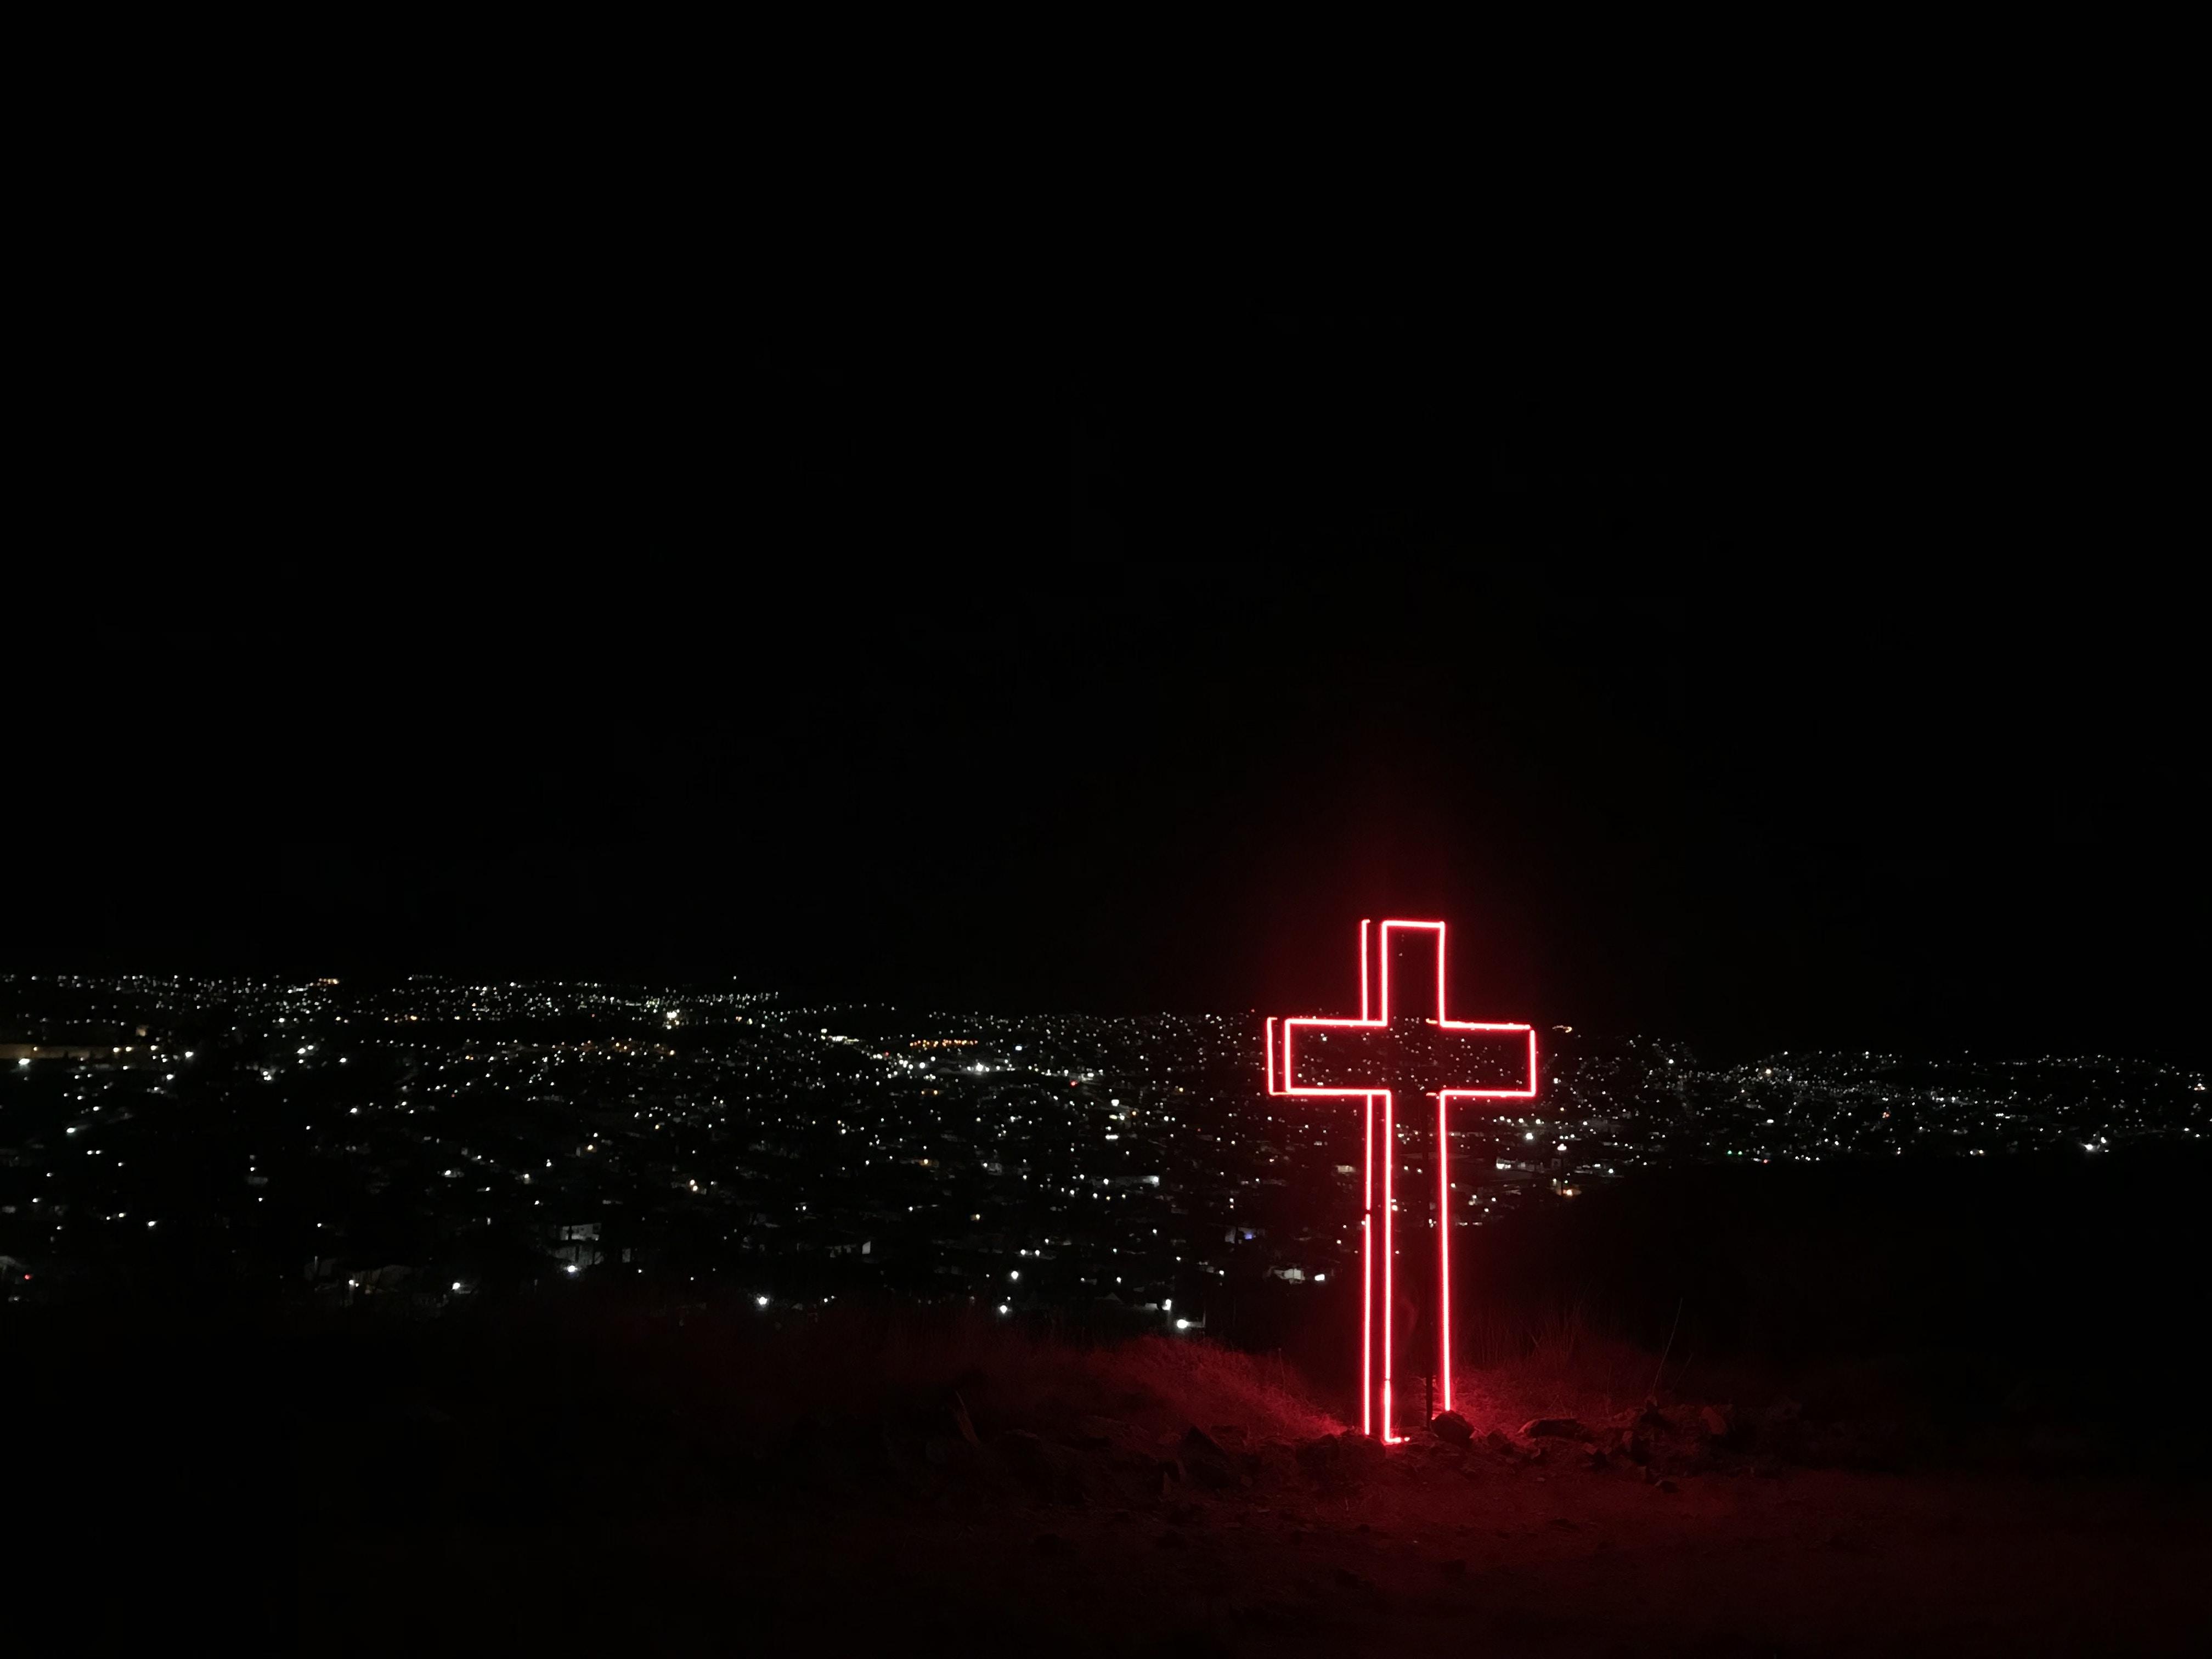 red neon light cross signage